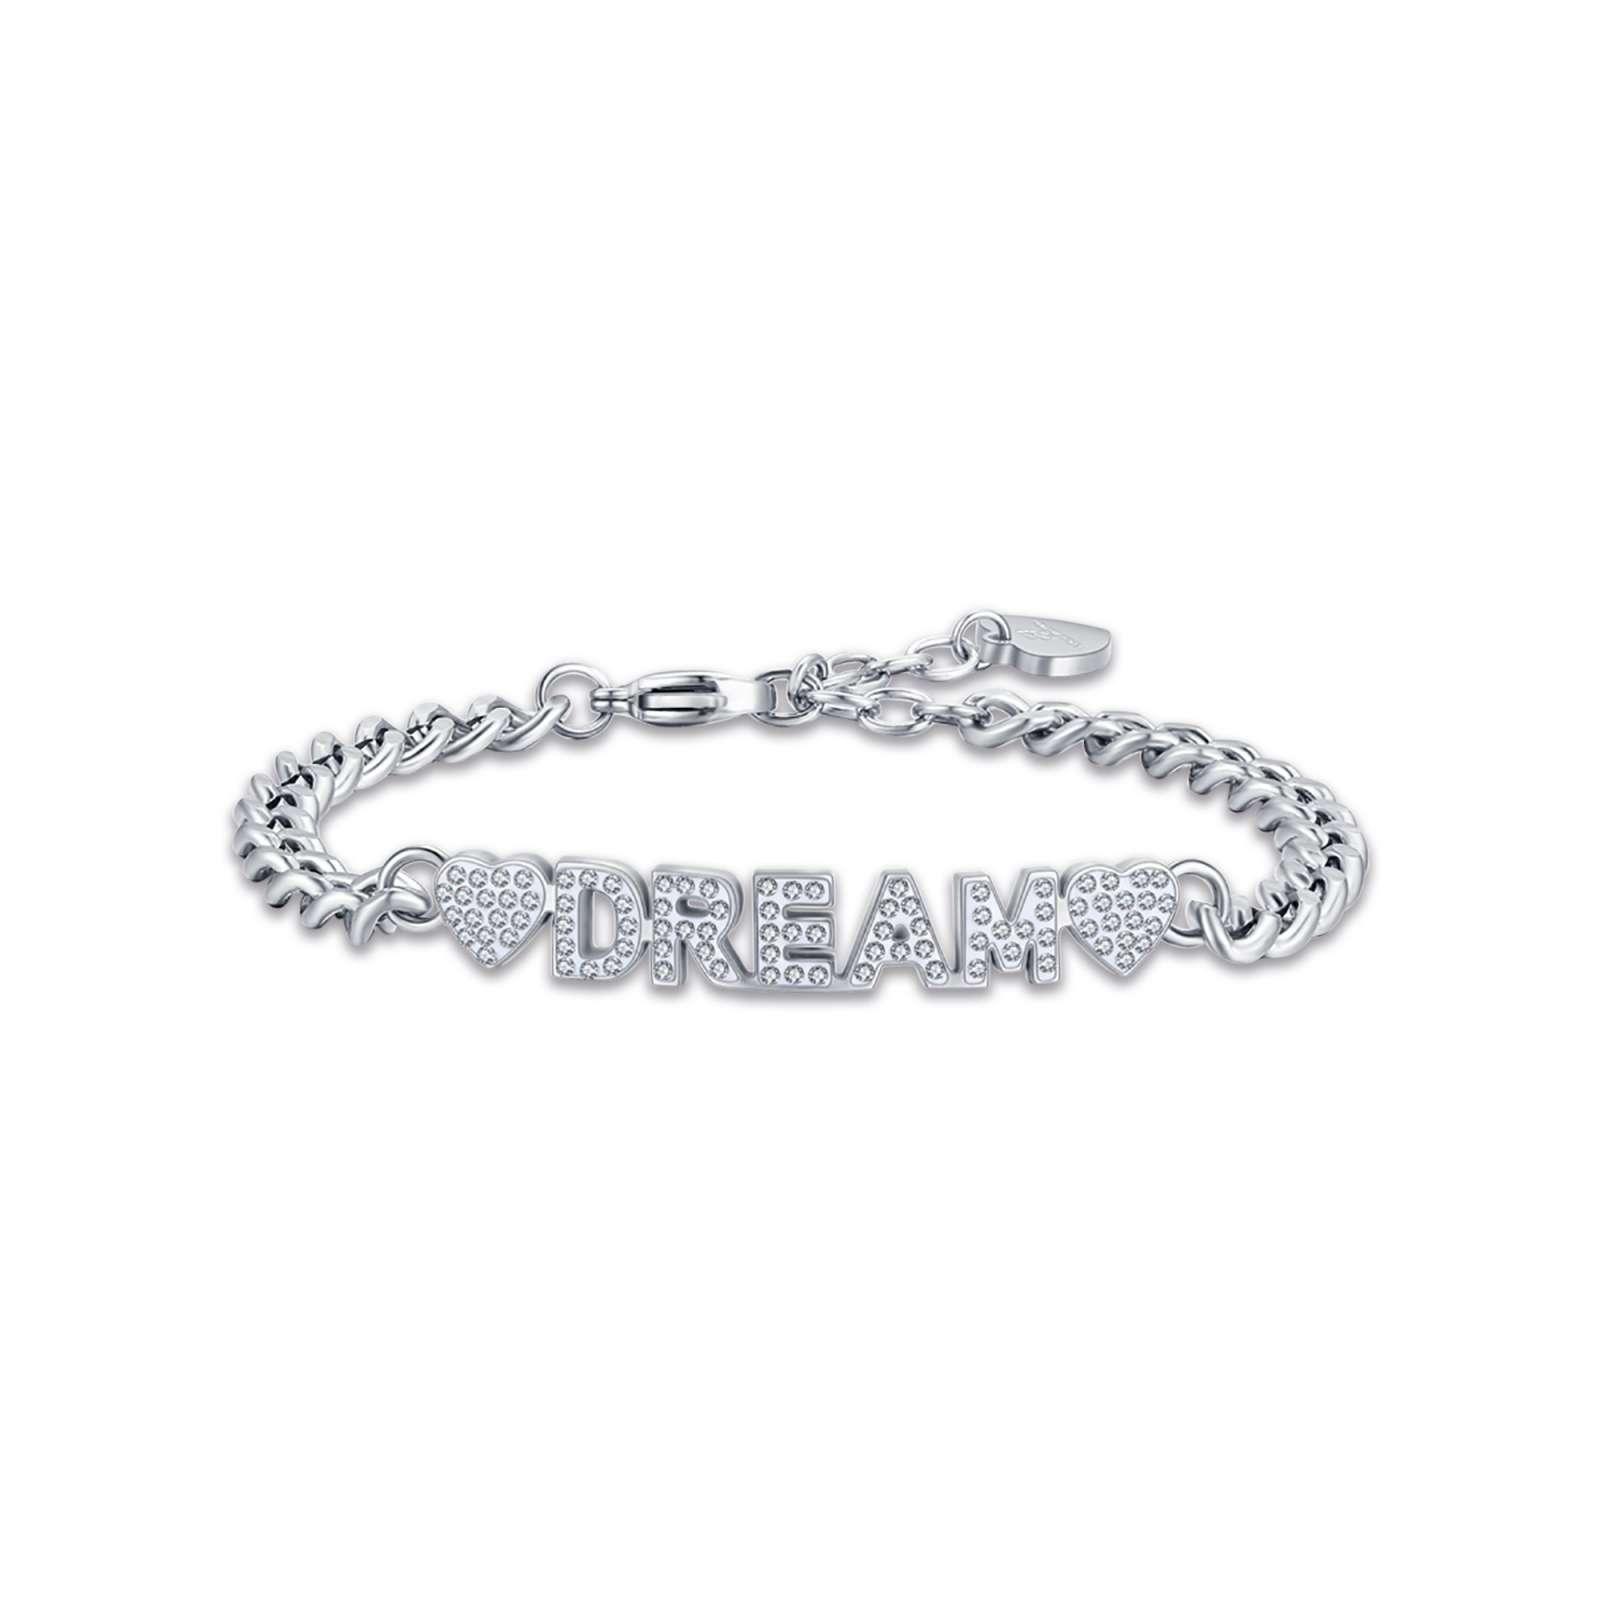 Luca Barra - Bracciale in acciaio dream con cristalli bianchi